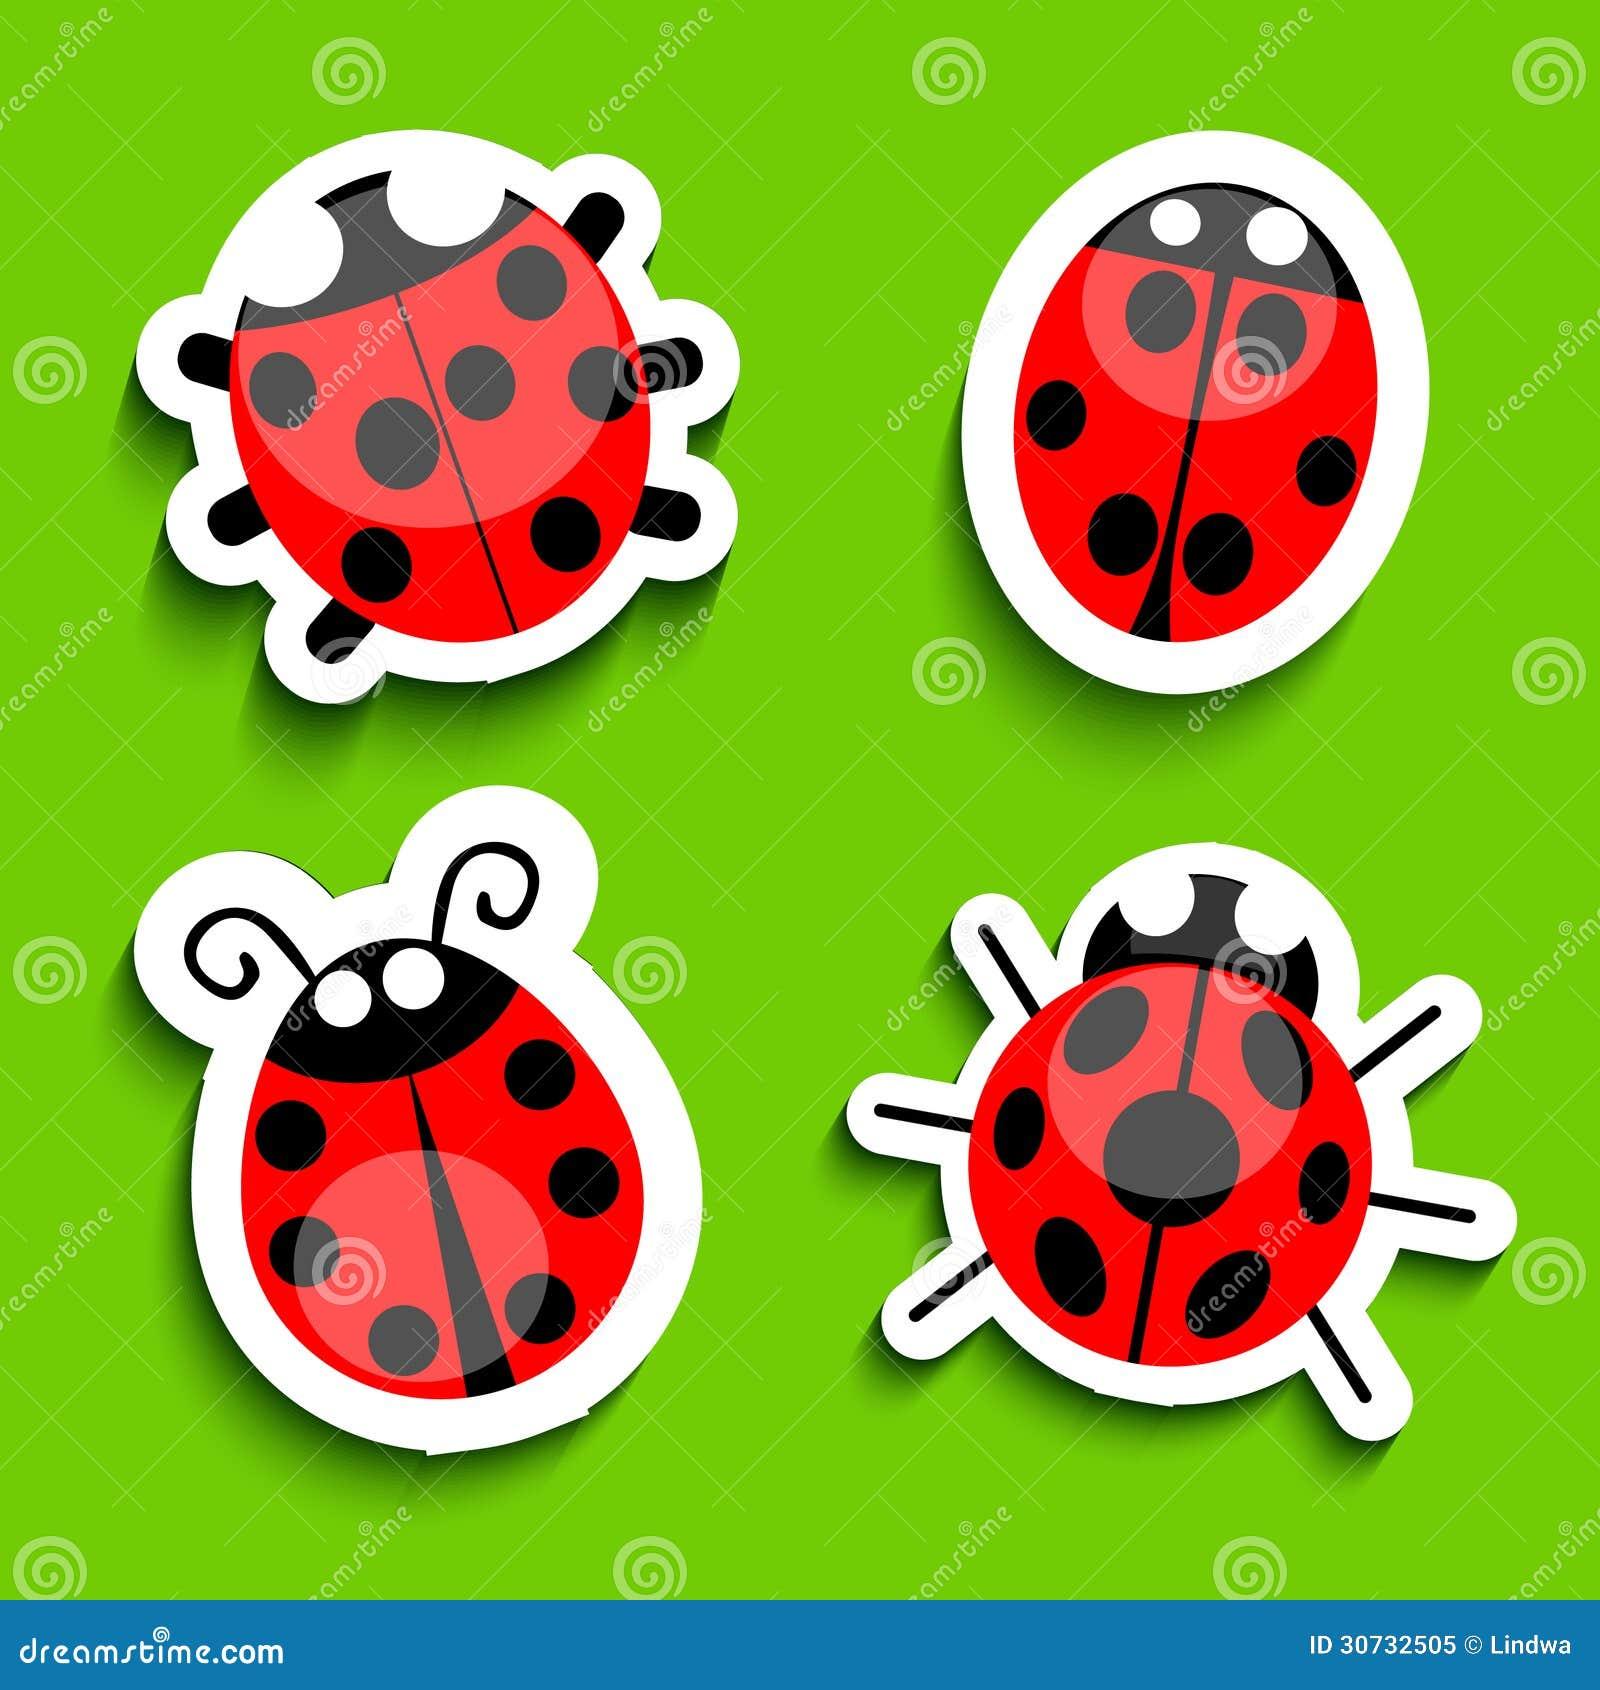 green ladybug clipart - photo #50